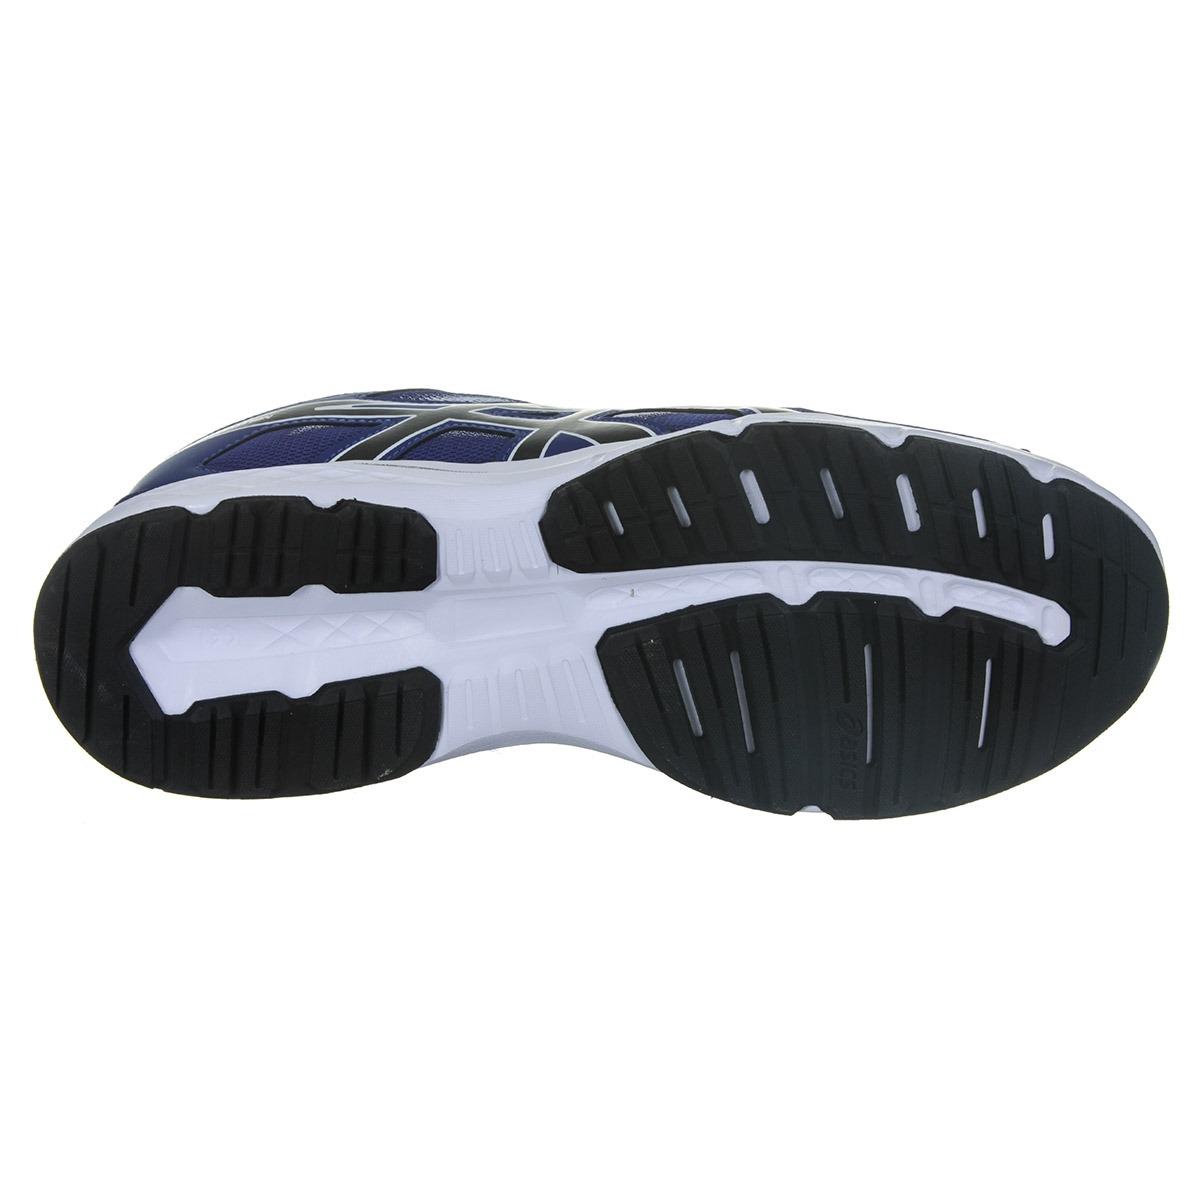 a0f25d4004 Tênis Asics Gel Transition Masculino - R$ 249,90 em Mercado Livre